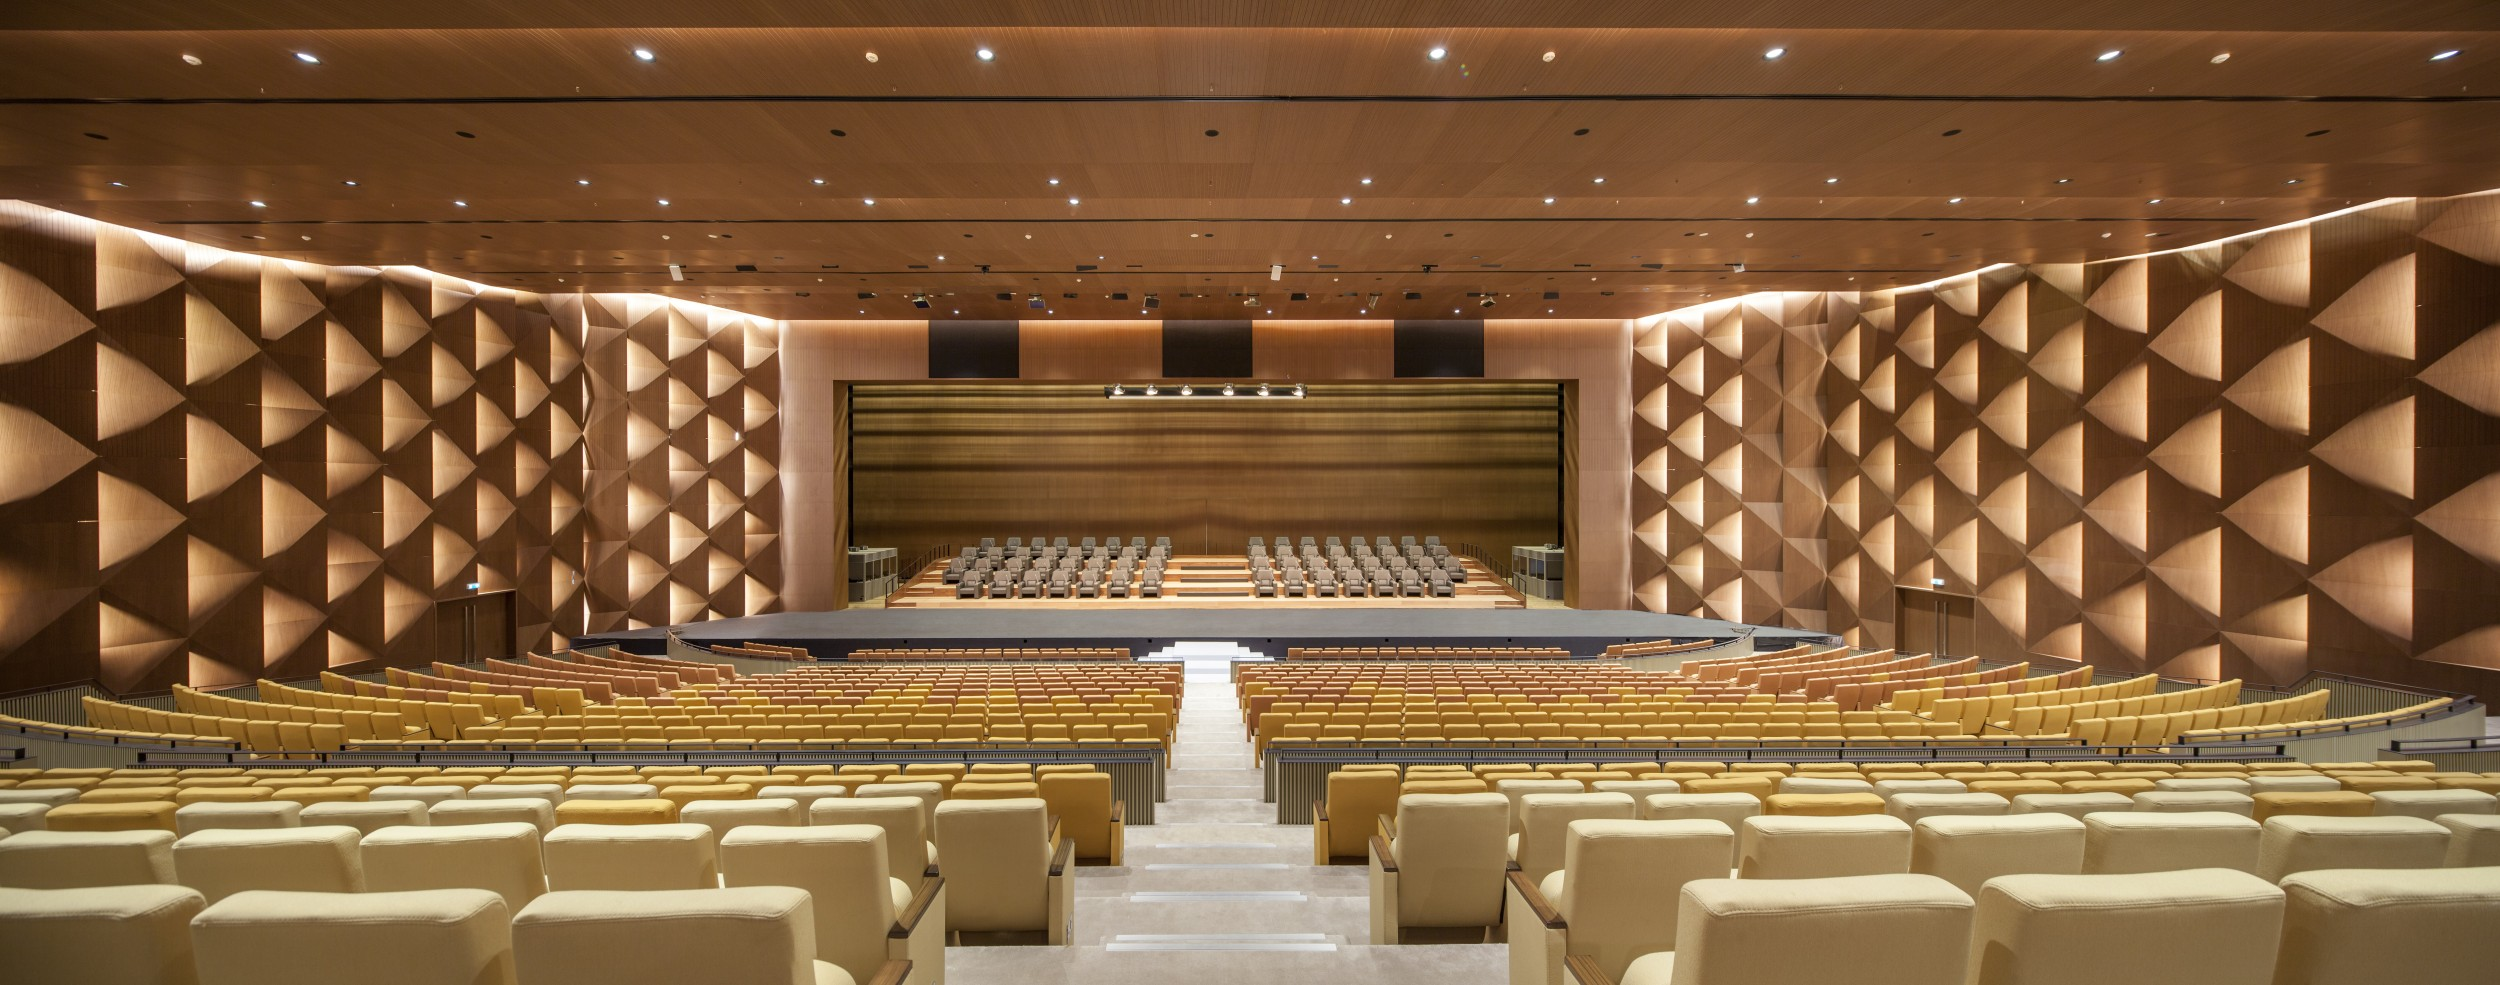 Dakar Congress Center, Tabanlioglu Architects © Emre Dörter